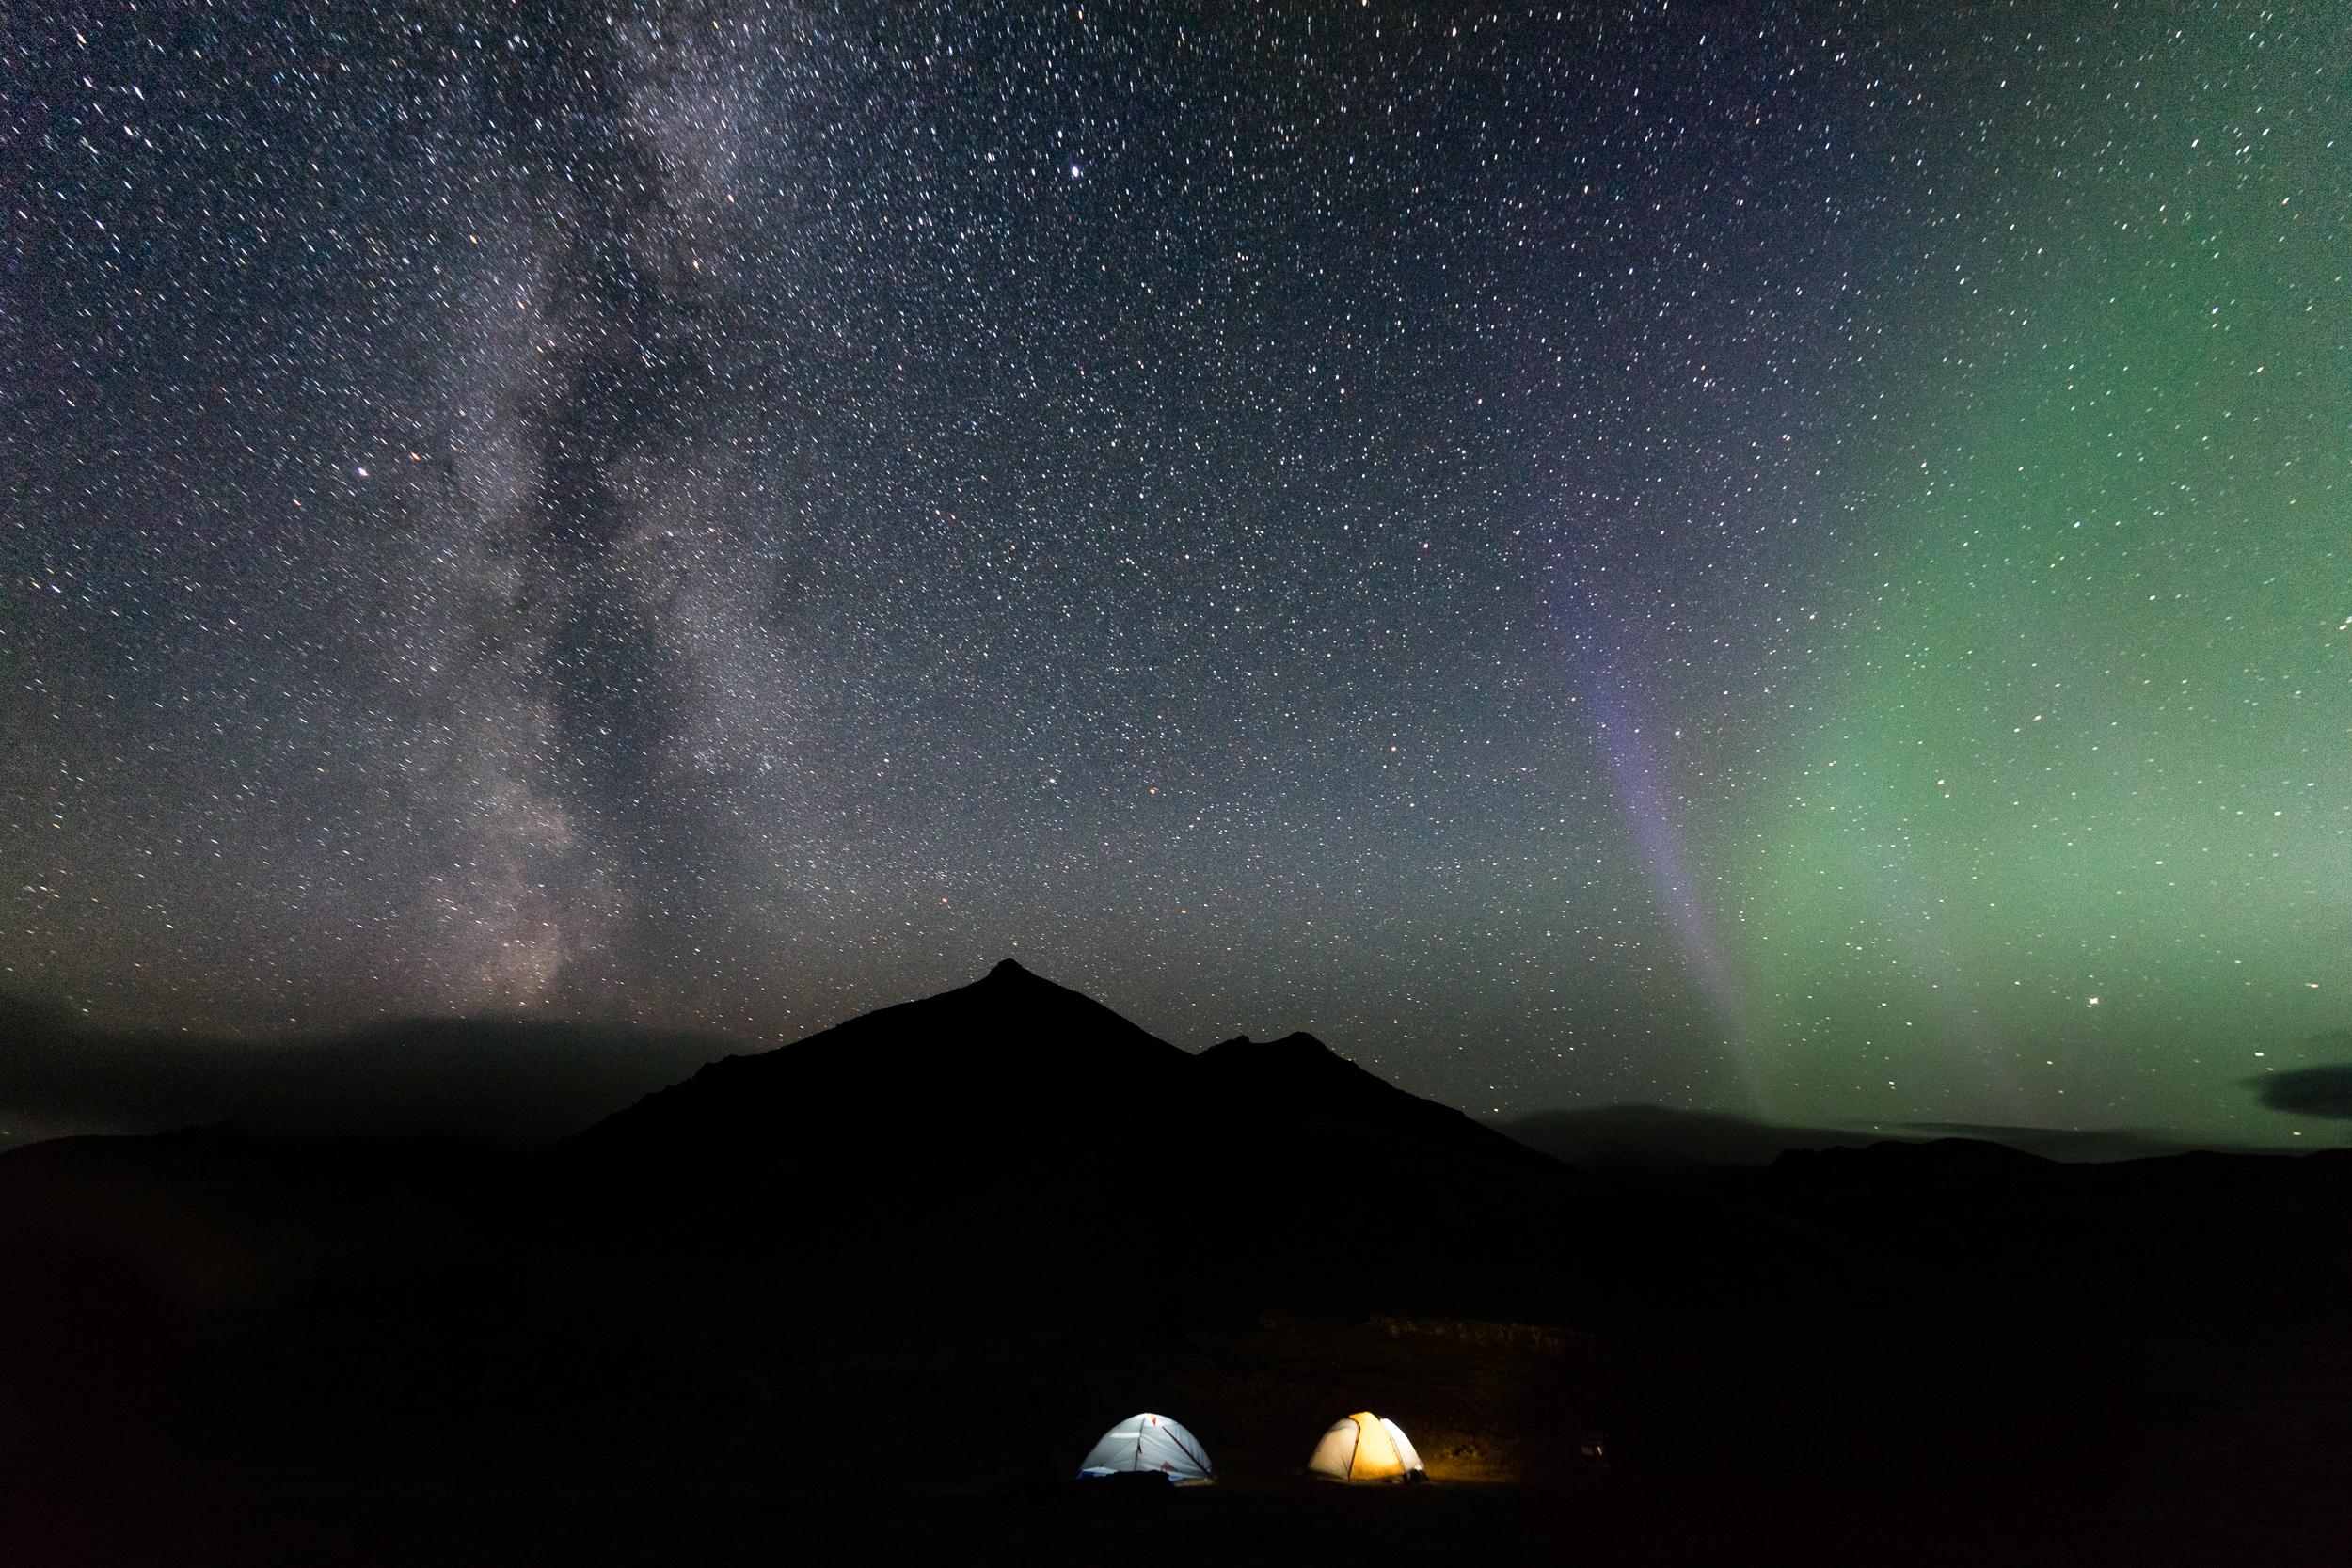 Iceland - 00595-2_ME - Chris Goetchius 2017 - WEB UPLOAD ONLY.jpg